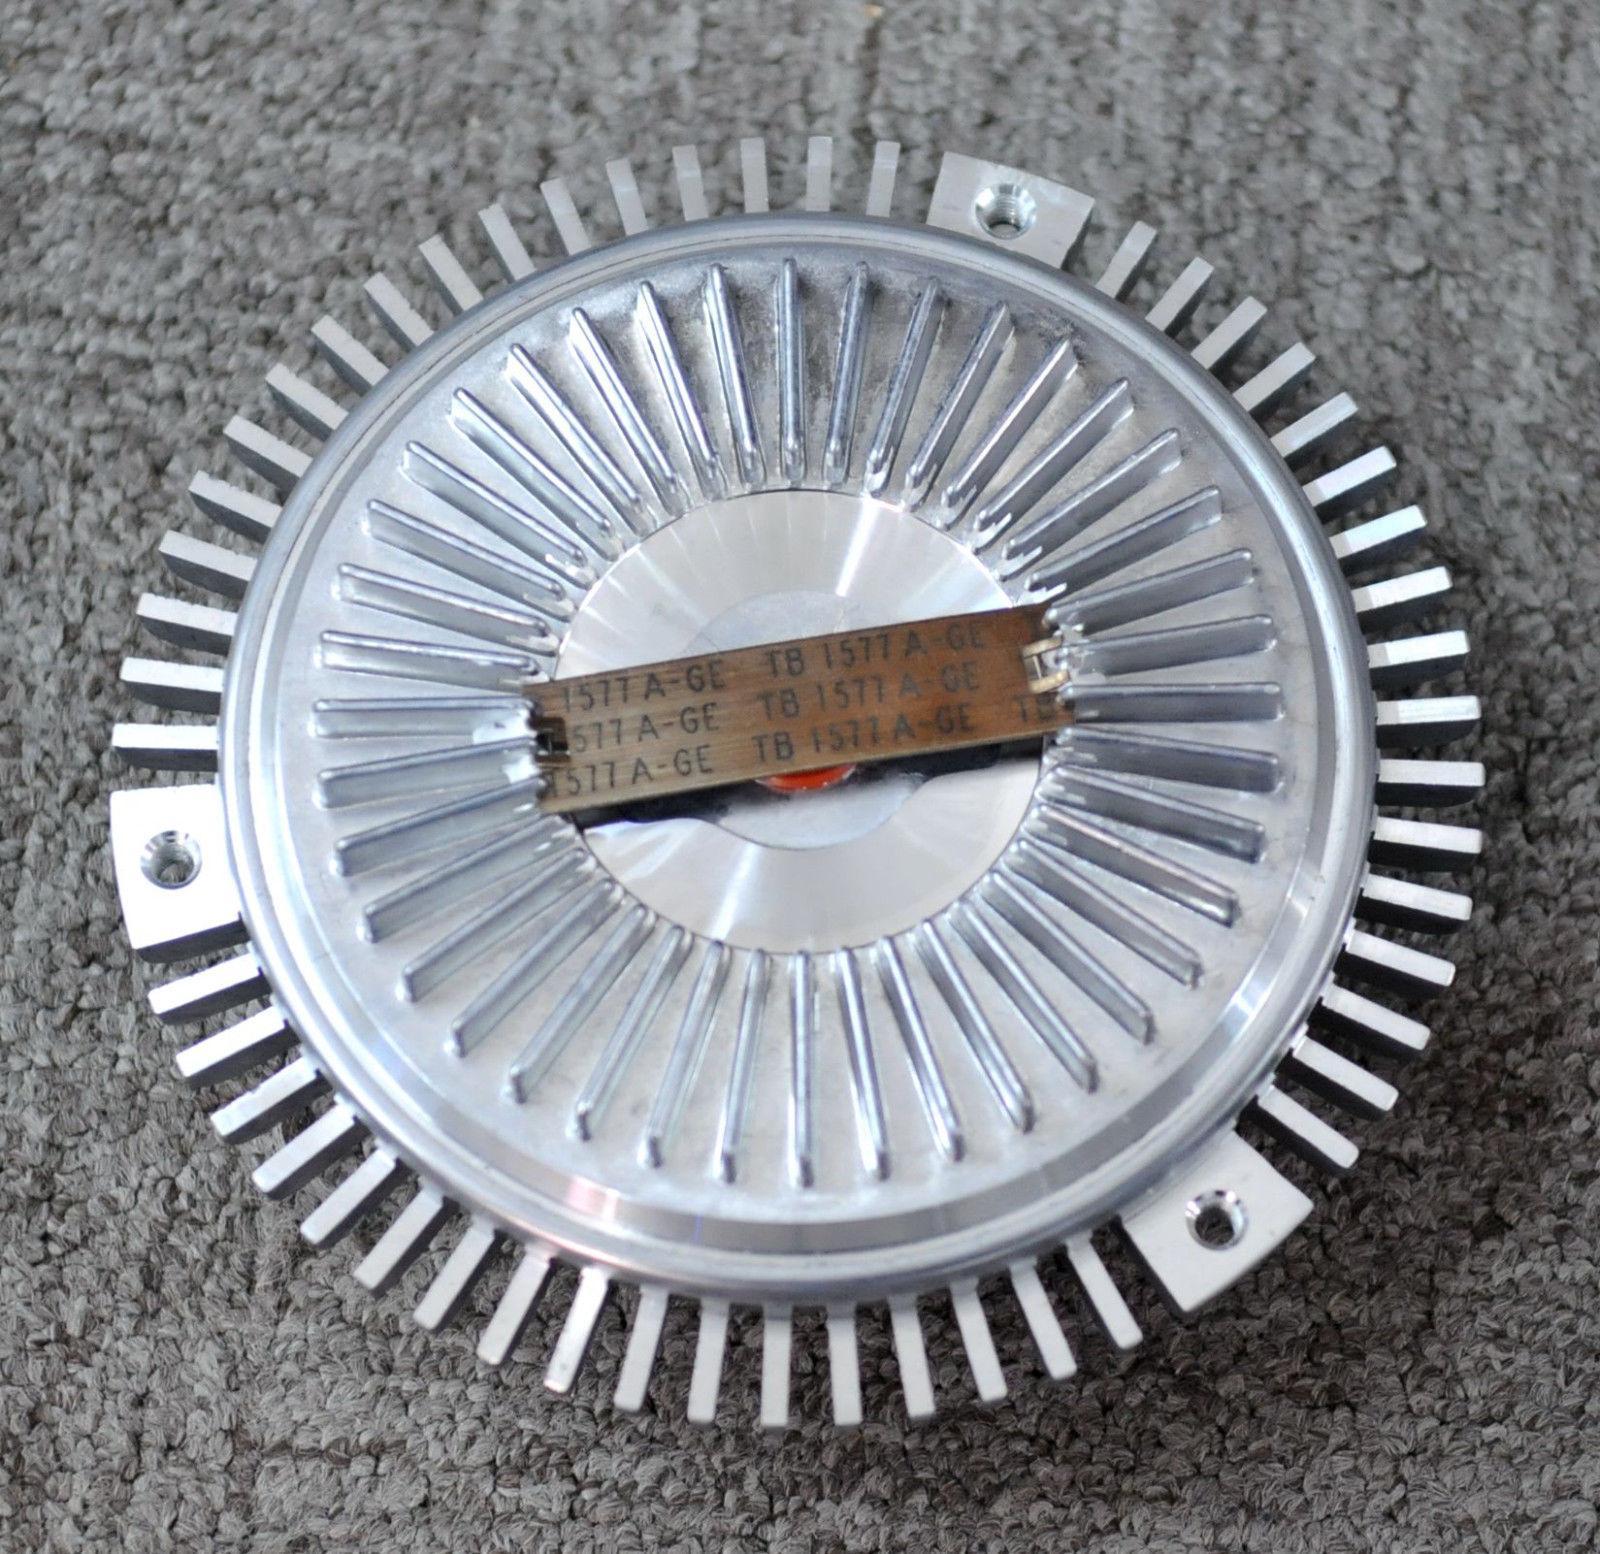 hose radiator autopart bmw valve water to